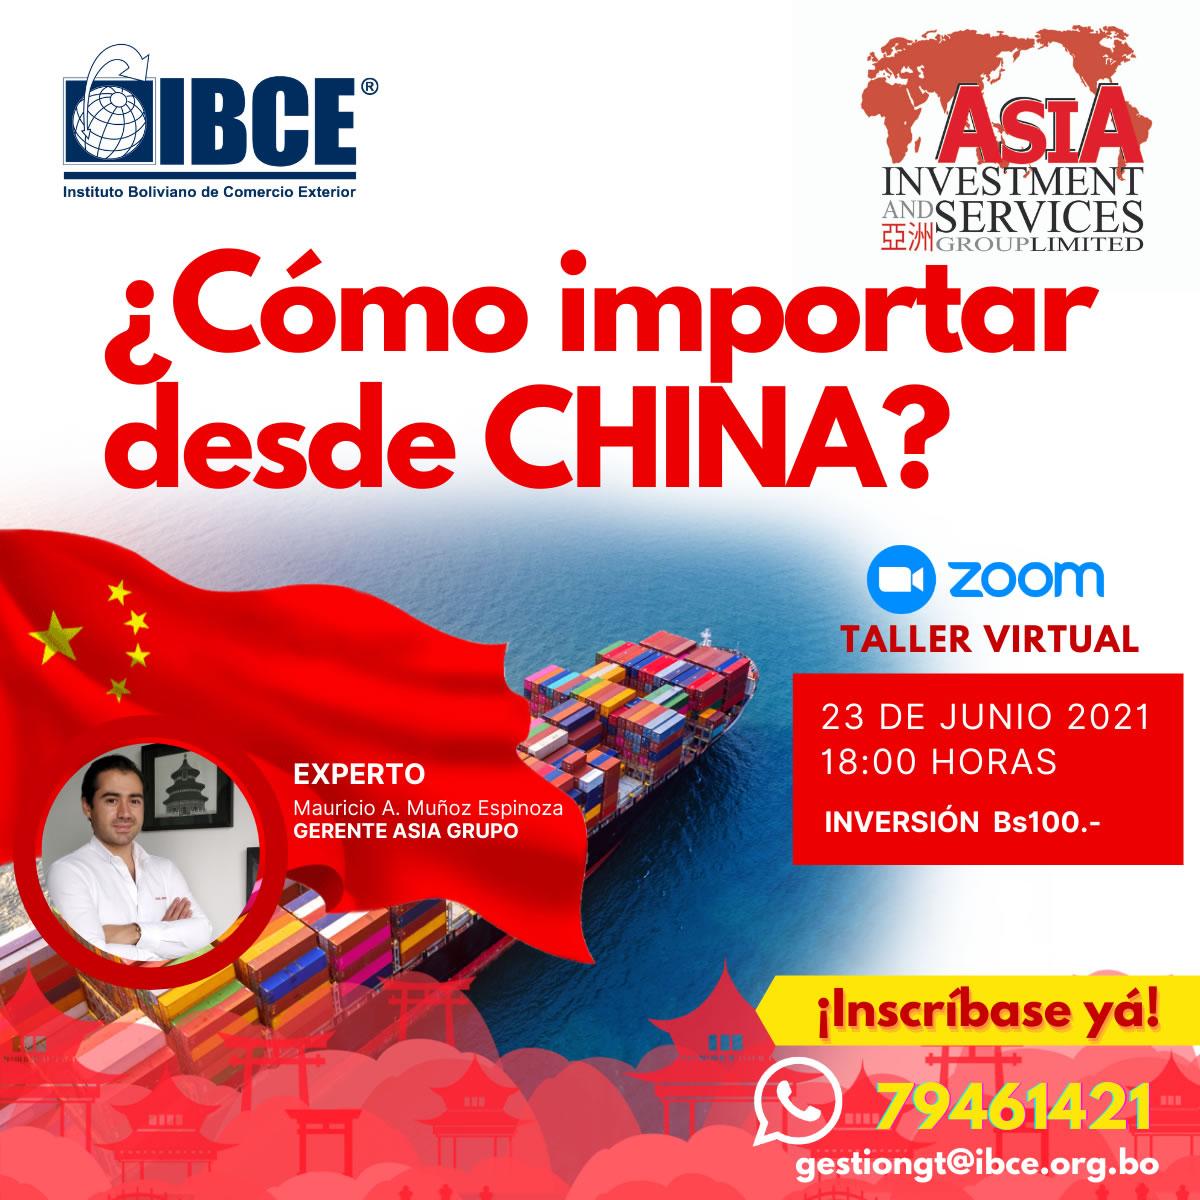 Taller Virtual Internacional ¿Cómo importar desde CHINA?